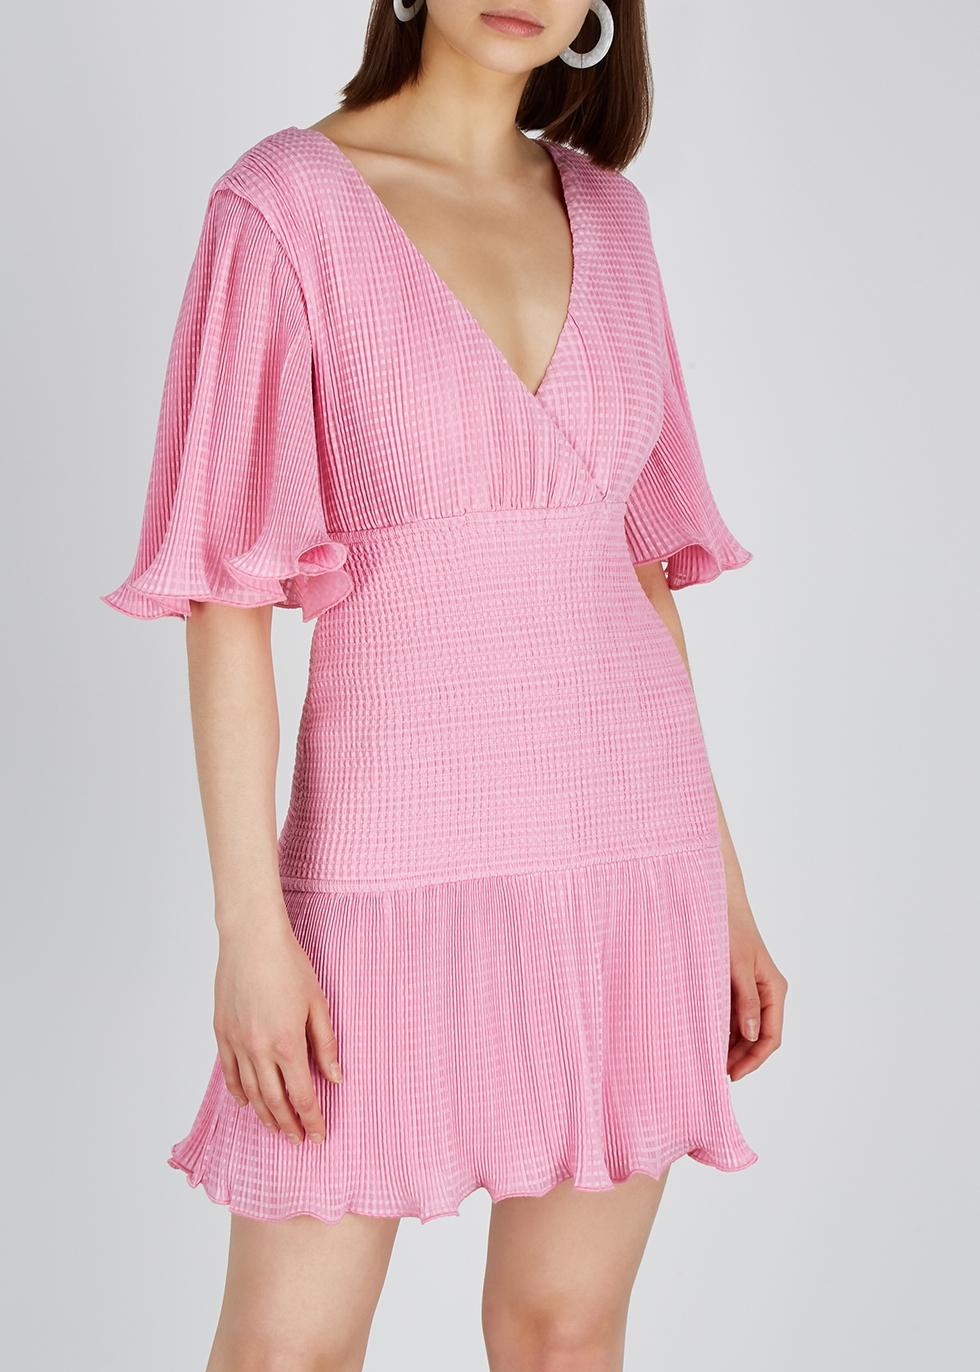 Clarity pink ruffled plissé mini dress - KEEPSAKE